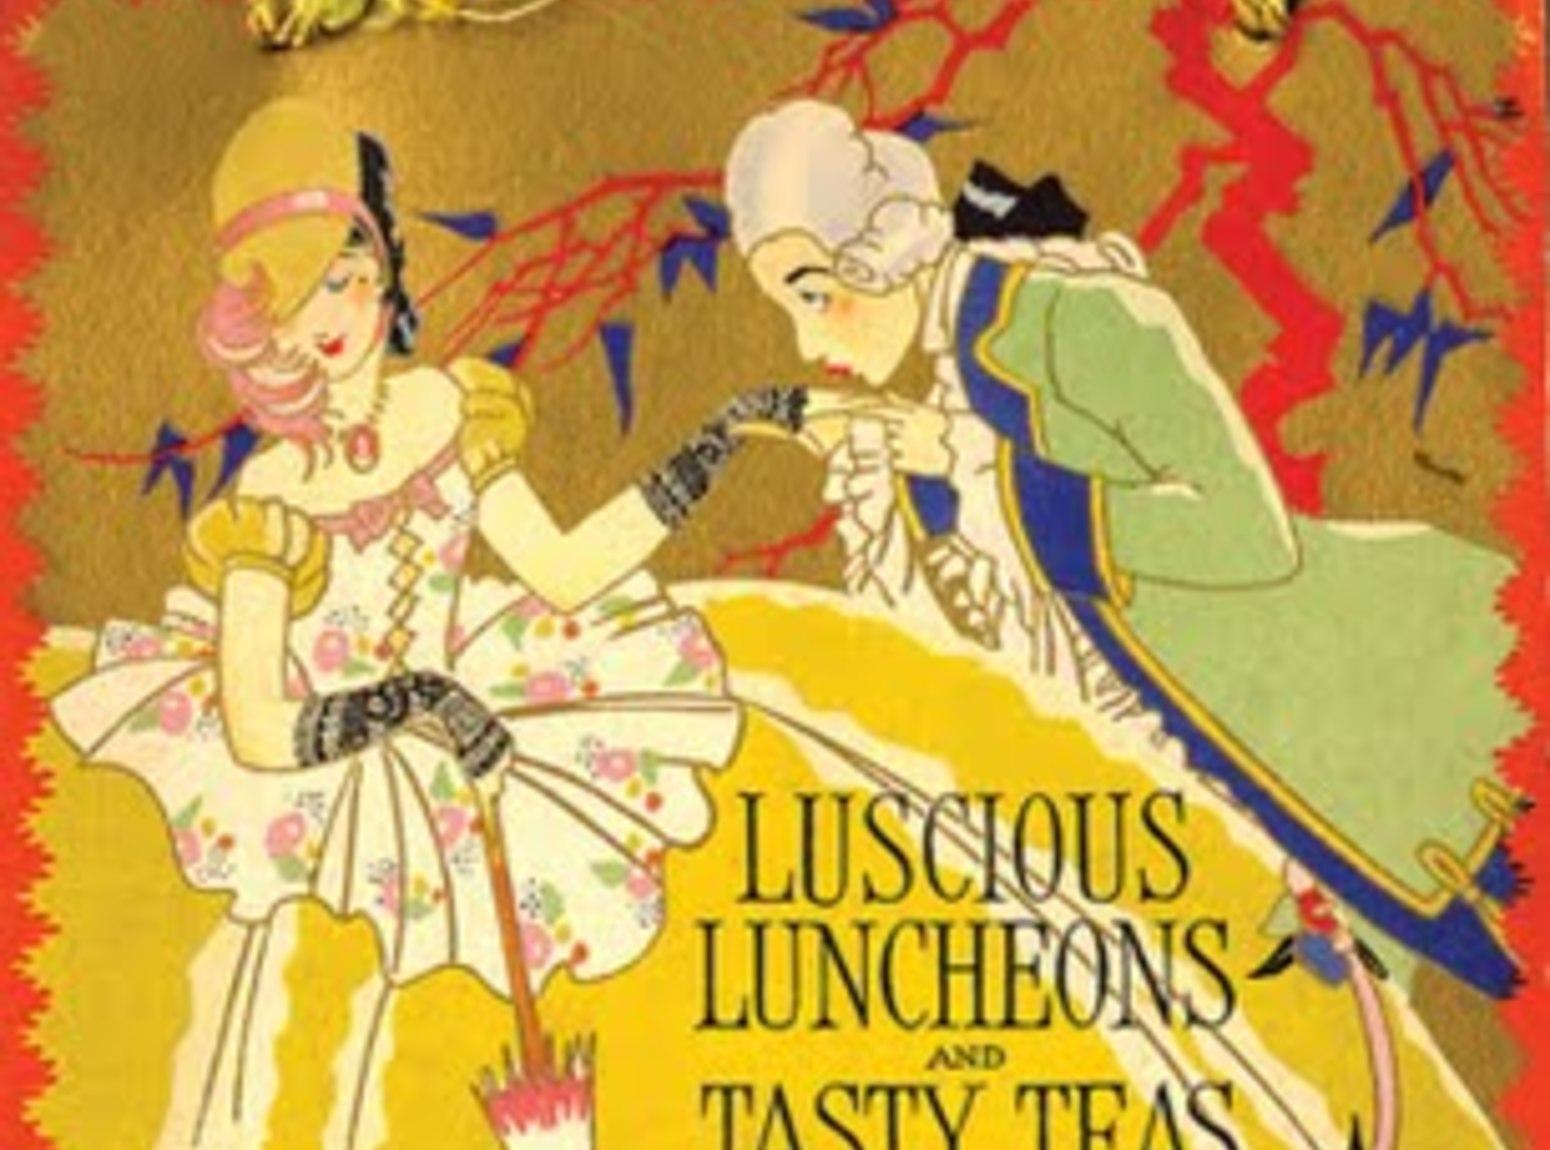 The Romance of the Kitchen - Ida Bailey Allen Recipe